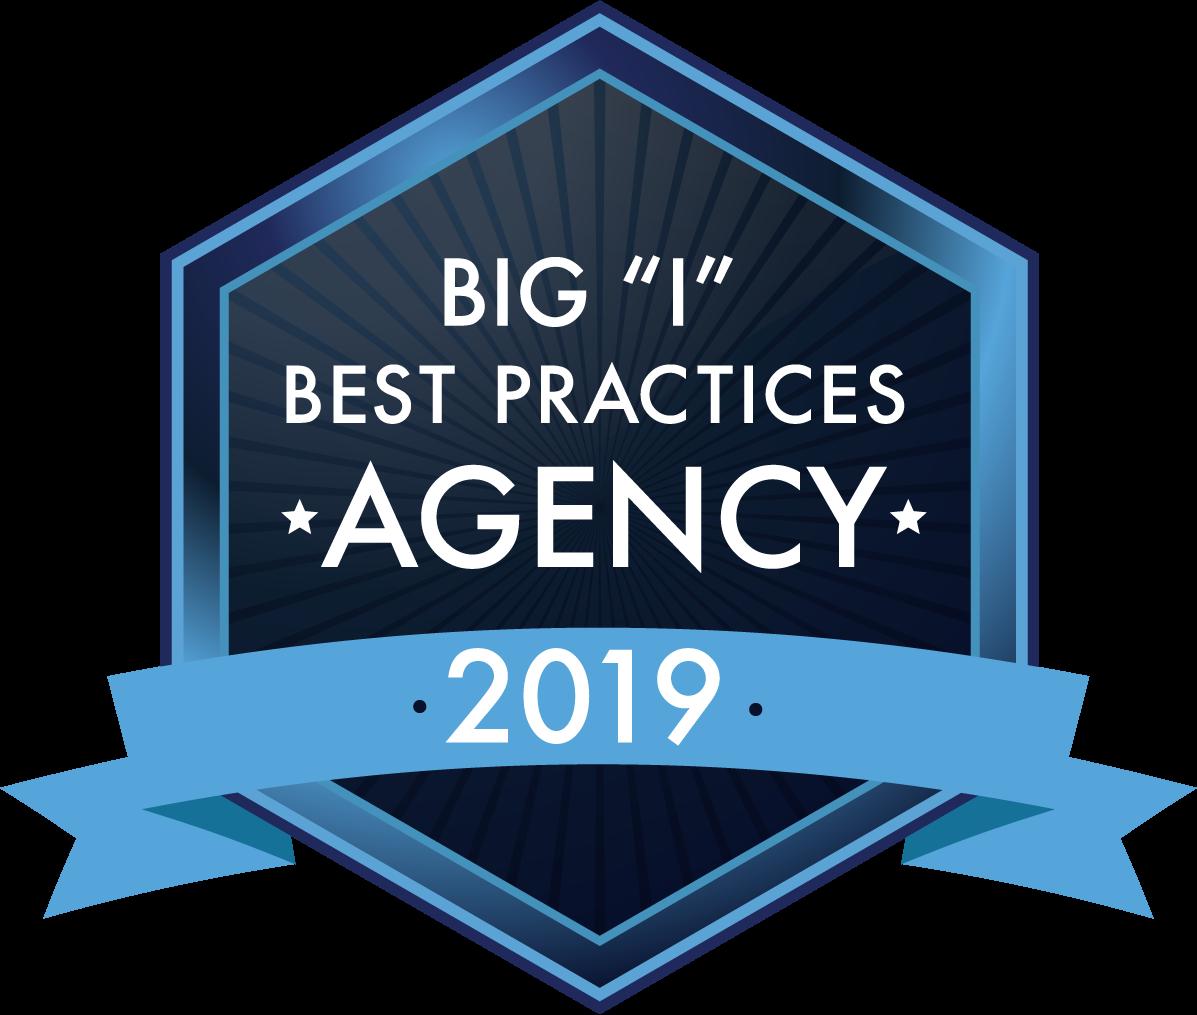 "Big ""I"" Best Practices Agency - 2019"